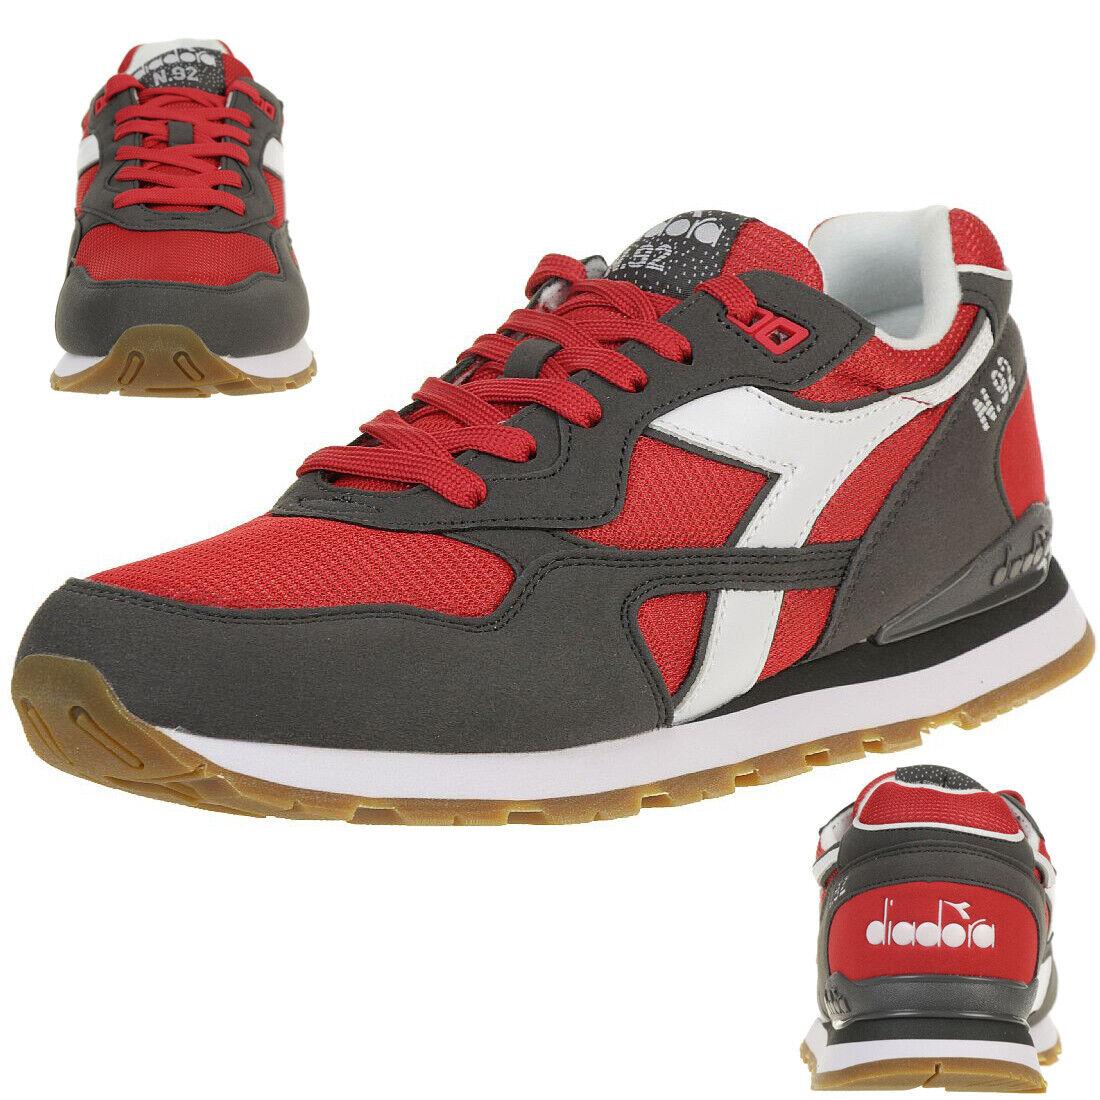 2dff7cf71079e6 Diadora Schuhe Herren Test Vergleich +++ Diadora Schuhe Herren ...